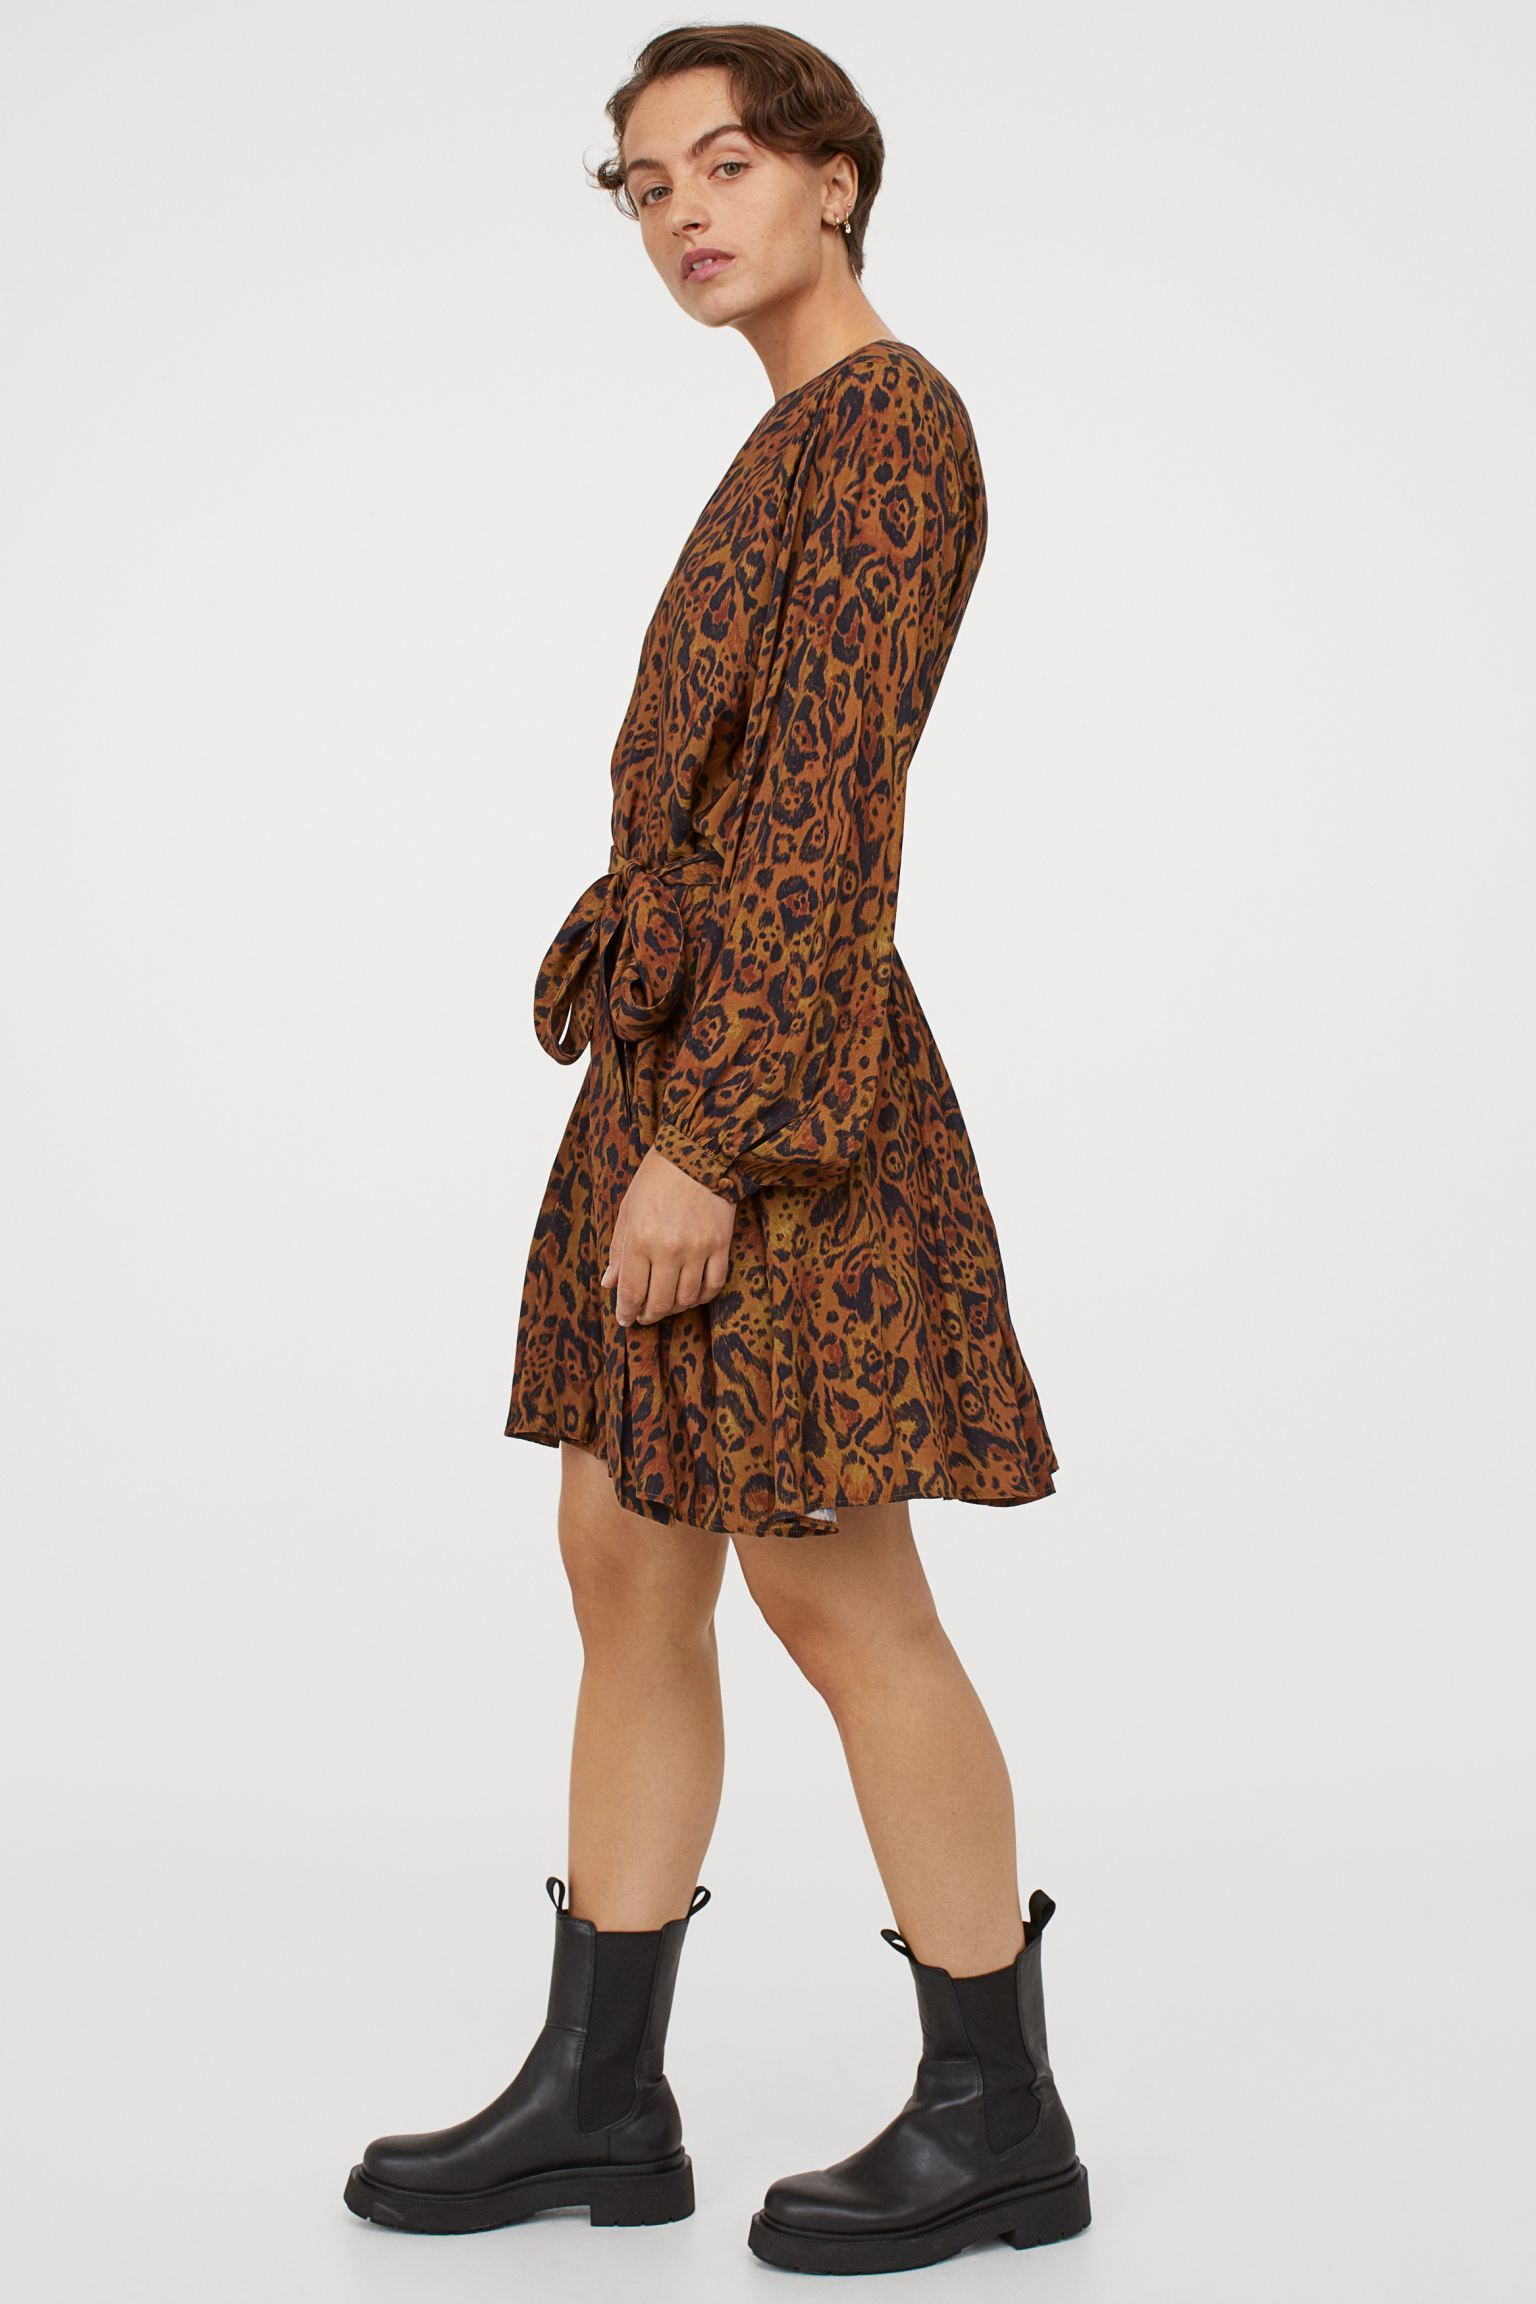 Model mit Kleid Animal-Print